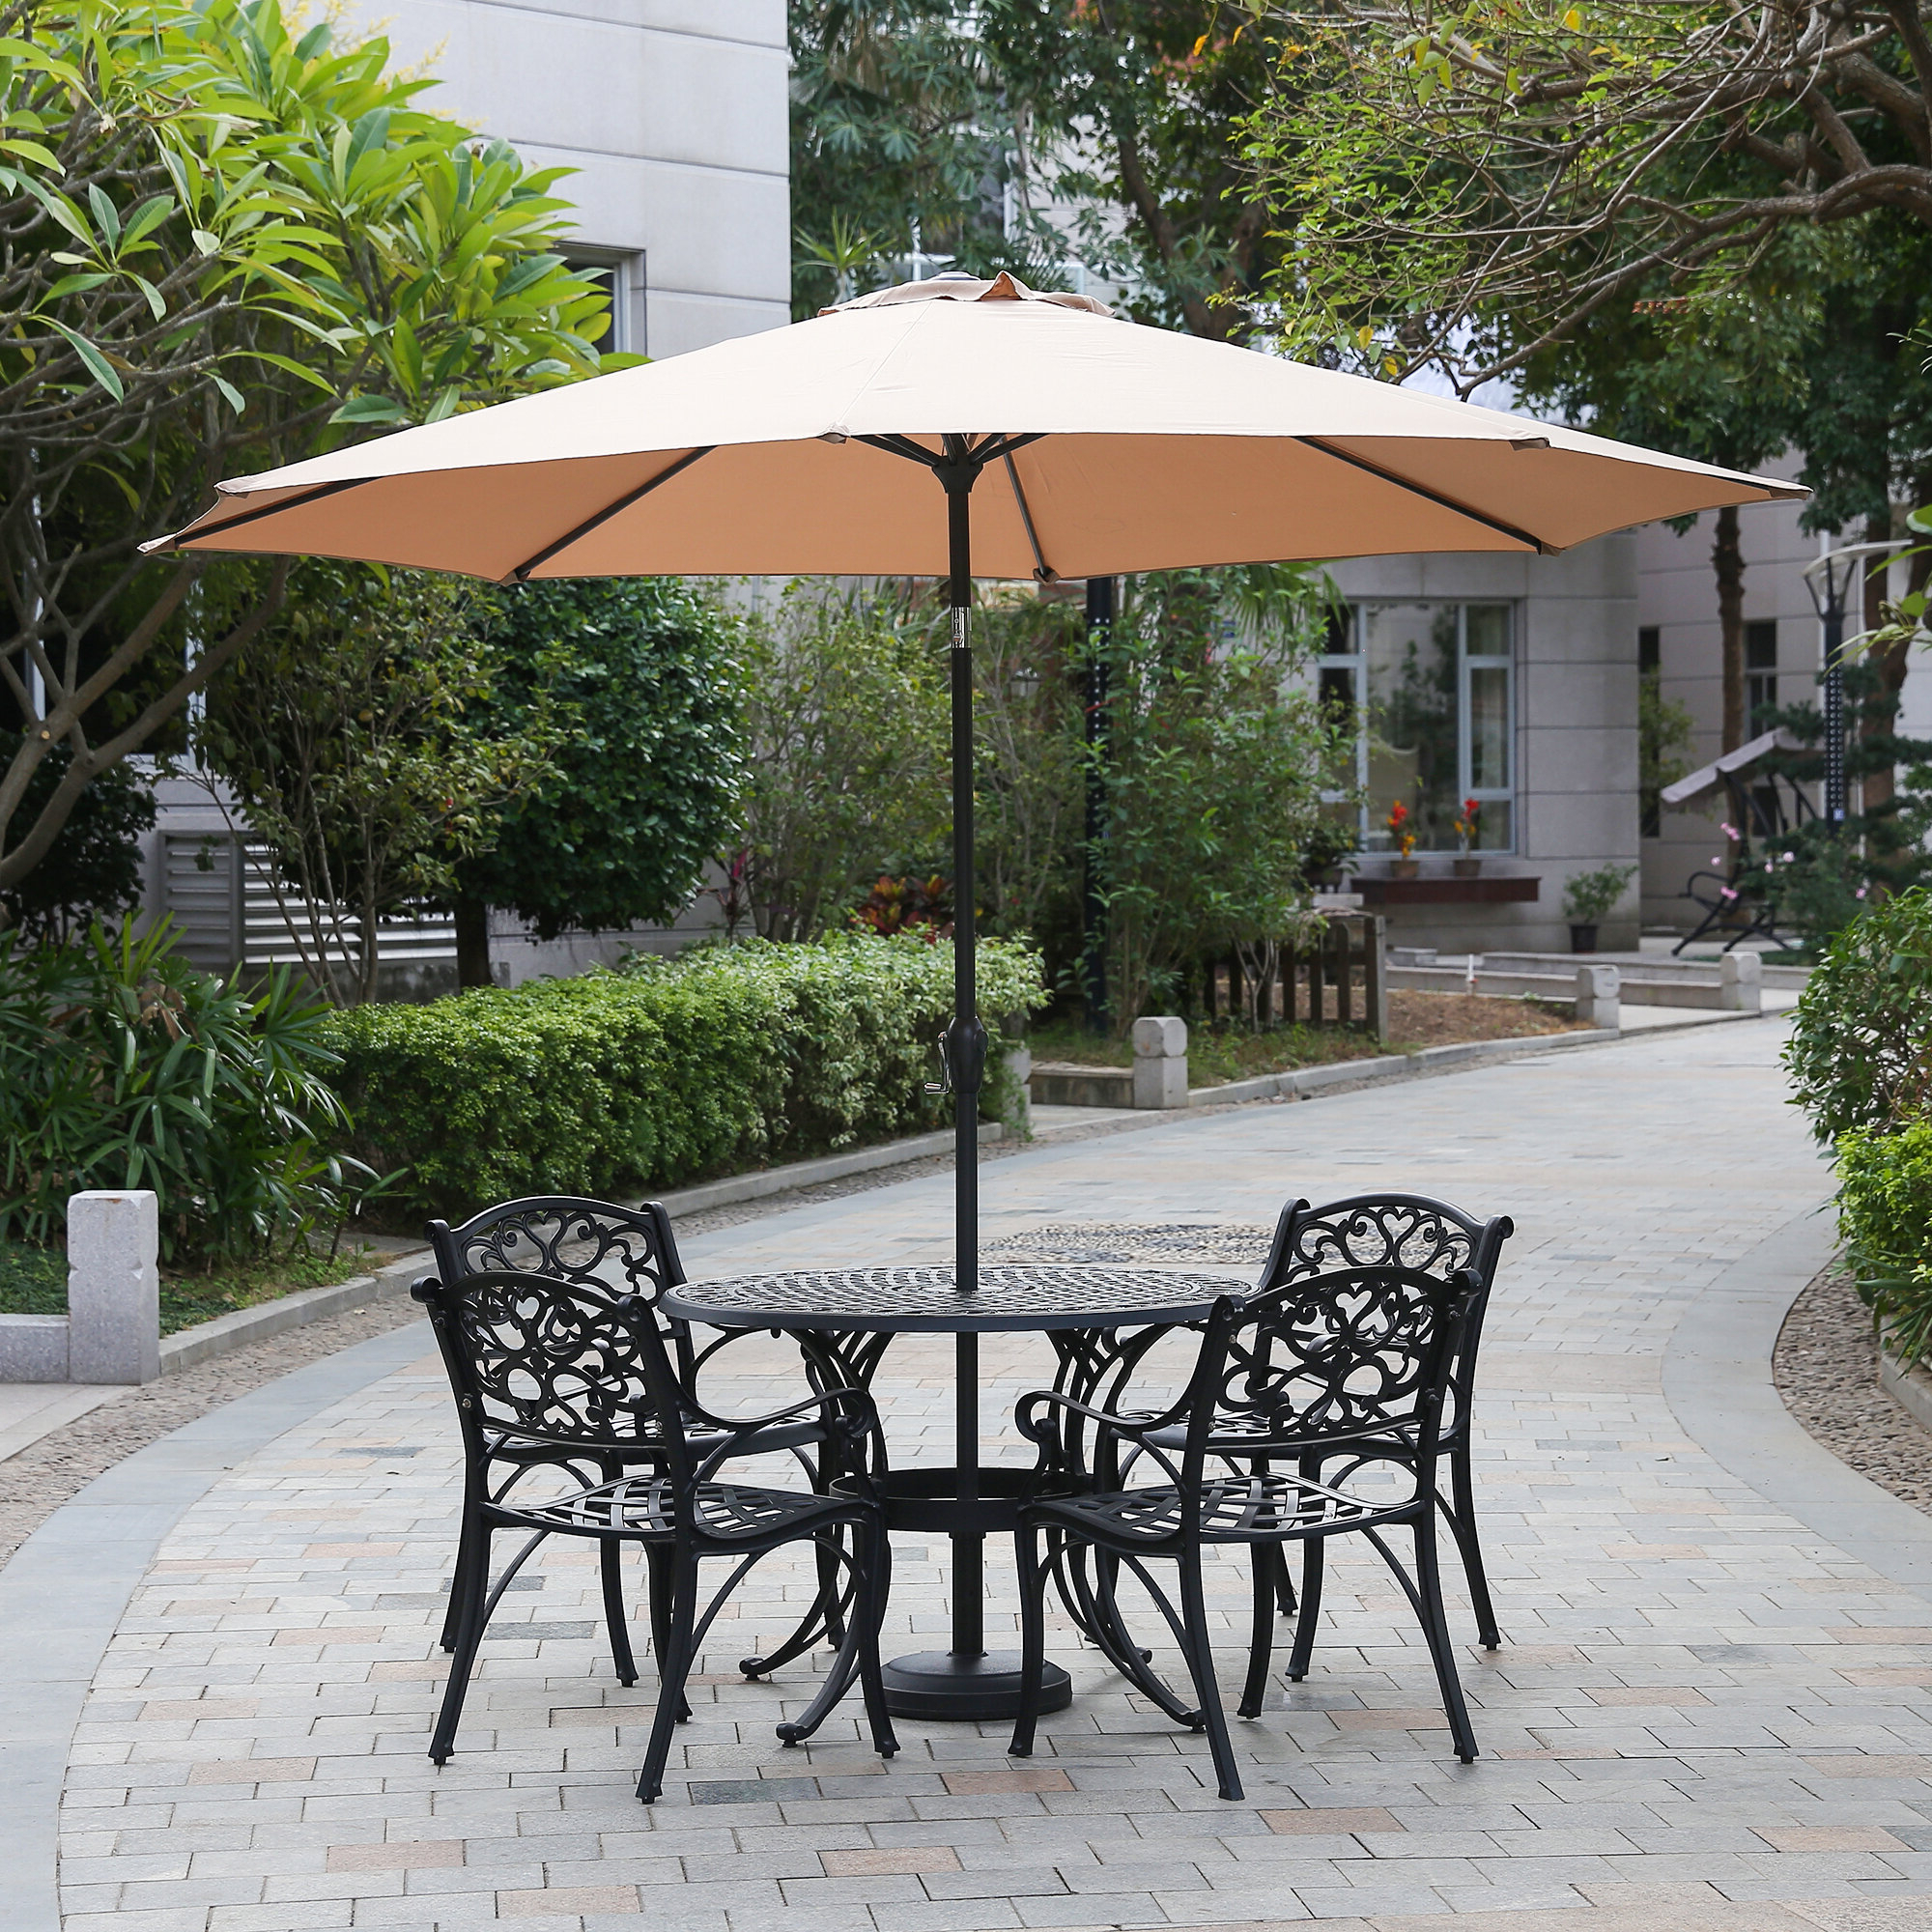 Brame Market Umbrellas In Popular Hatten 10' Market Umbrella (View 5 of 20)